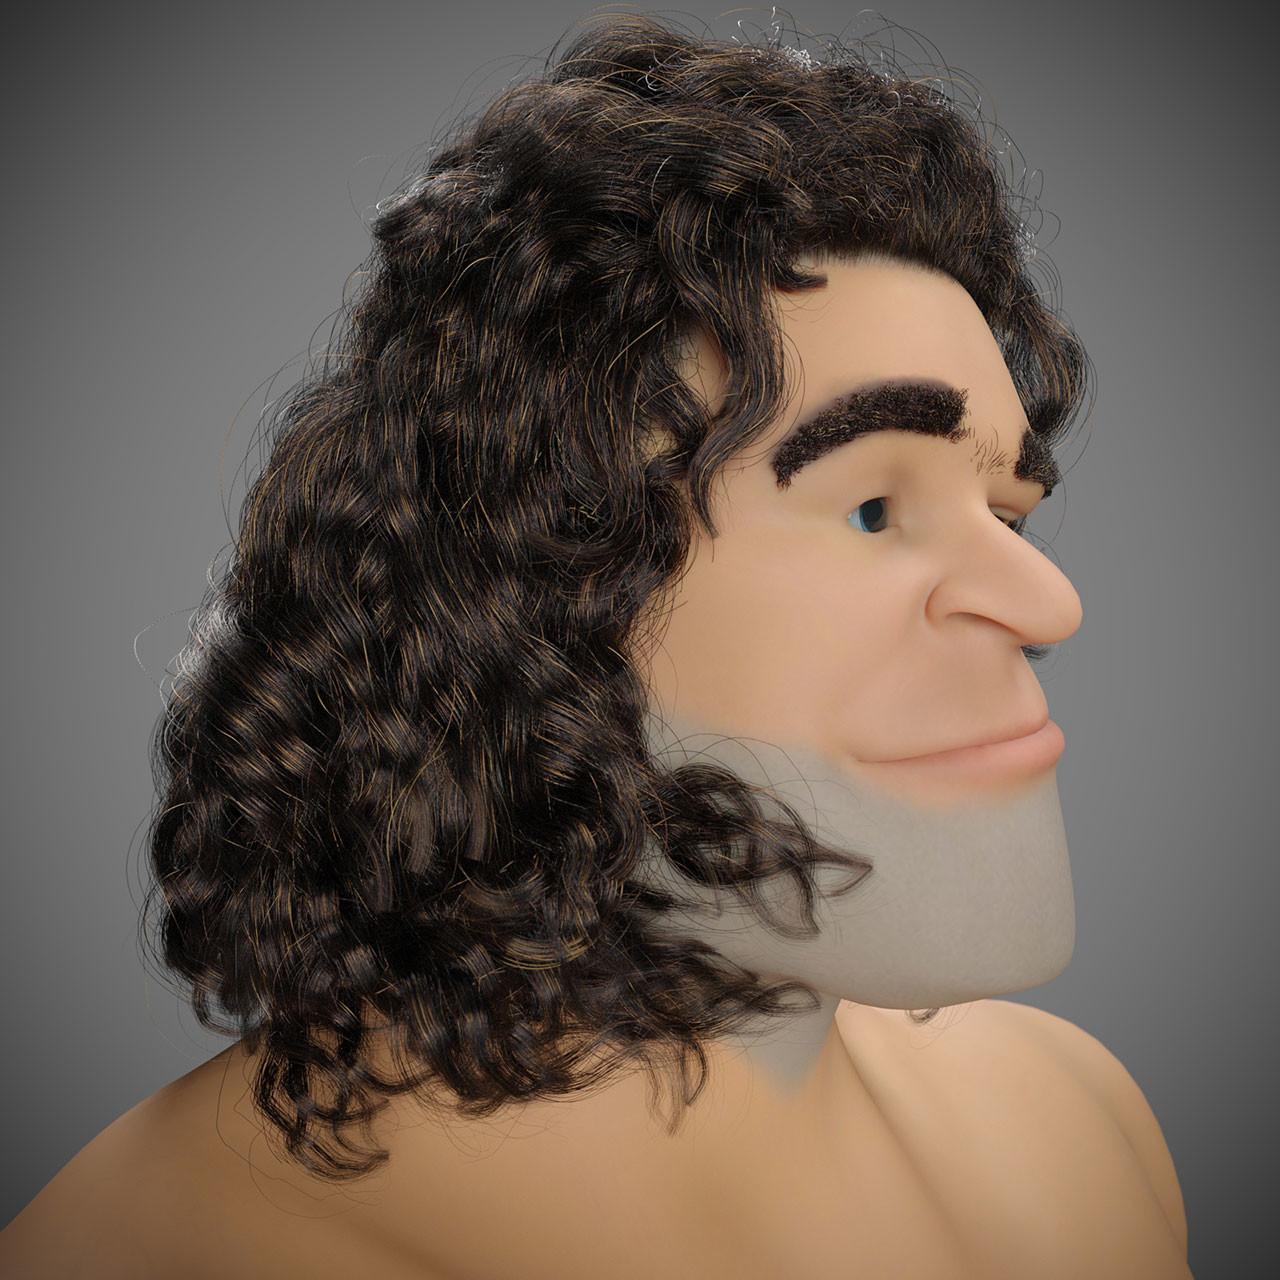 Andrew krivulya joseph hairstyle 1 r 10 by andrew krivulya